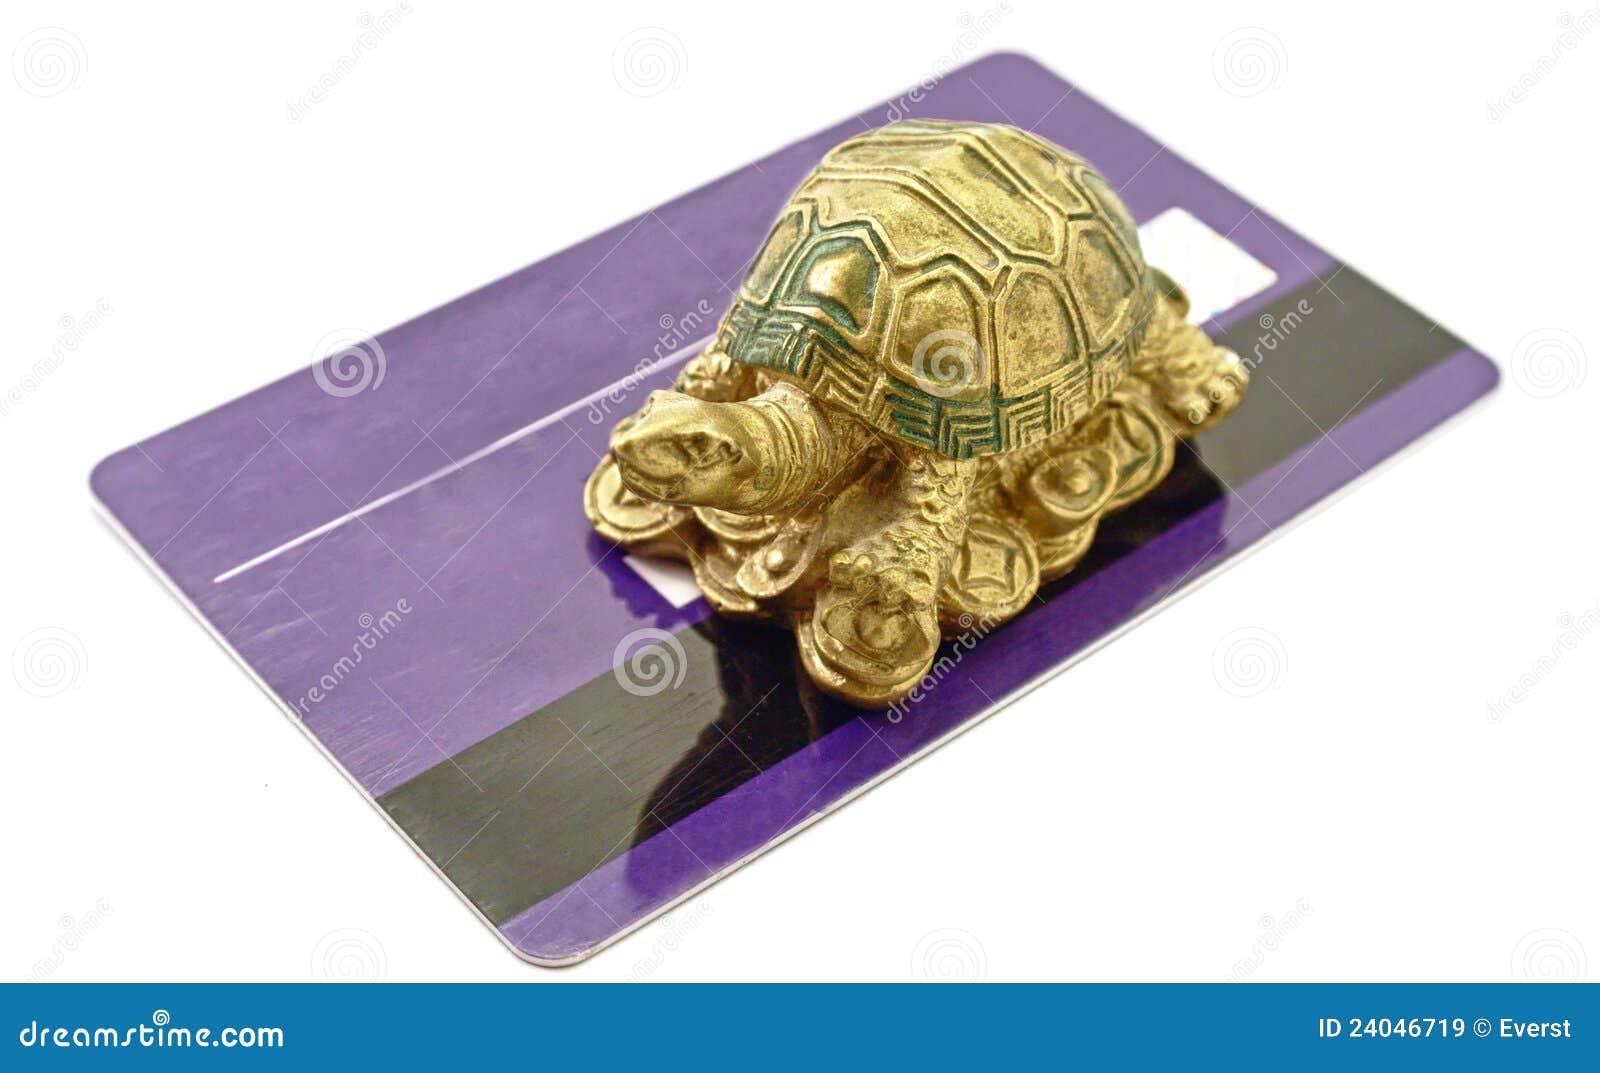 Feng Shui Tortoise Money stock image. Image of luck, gold - 24046719